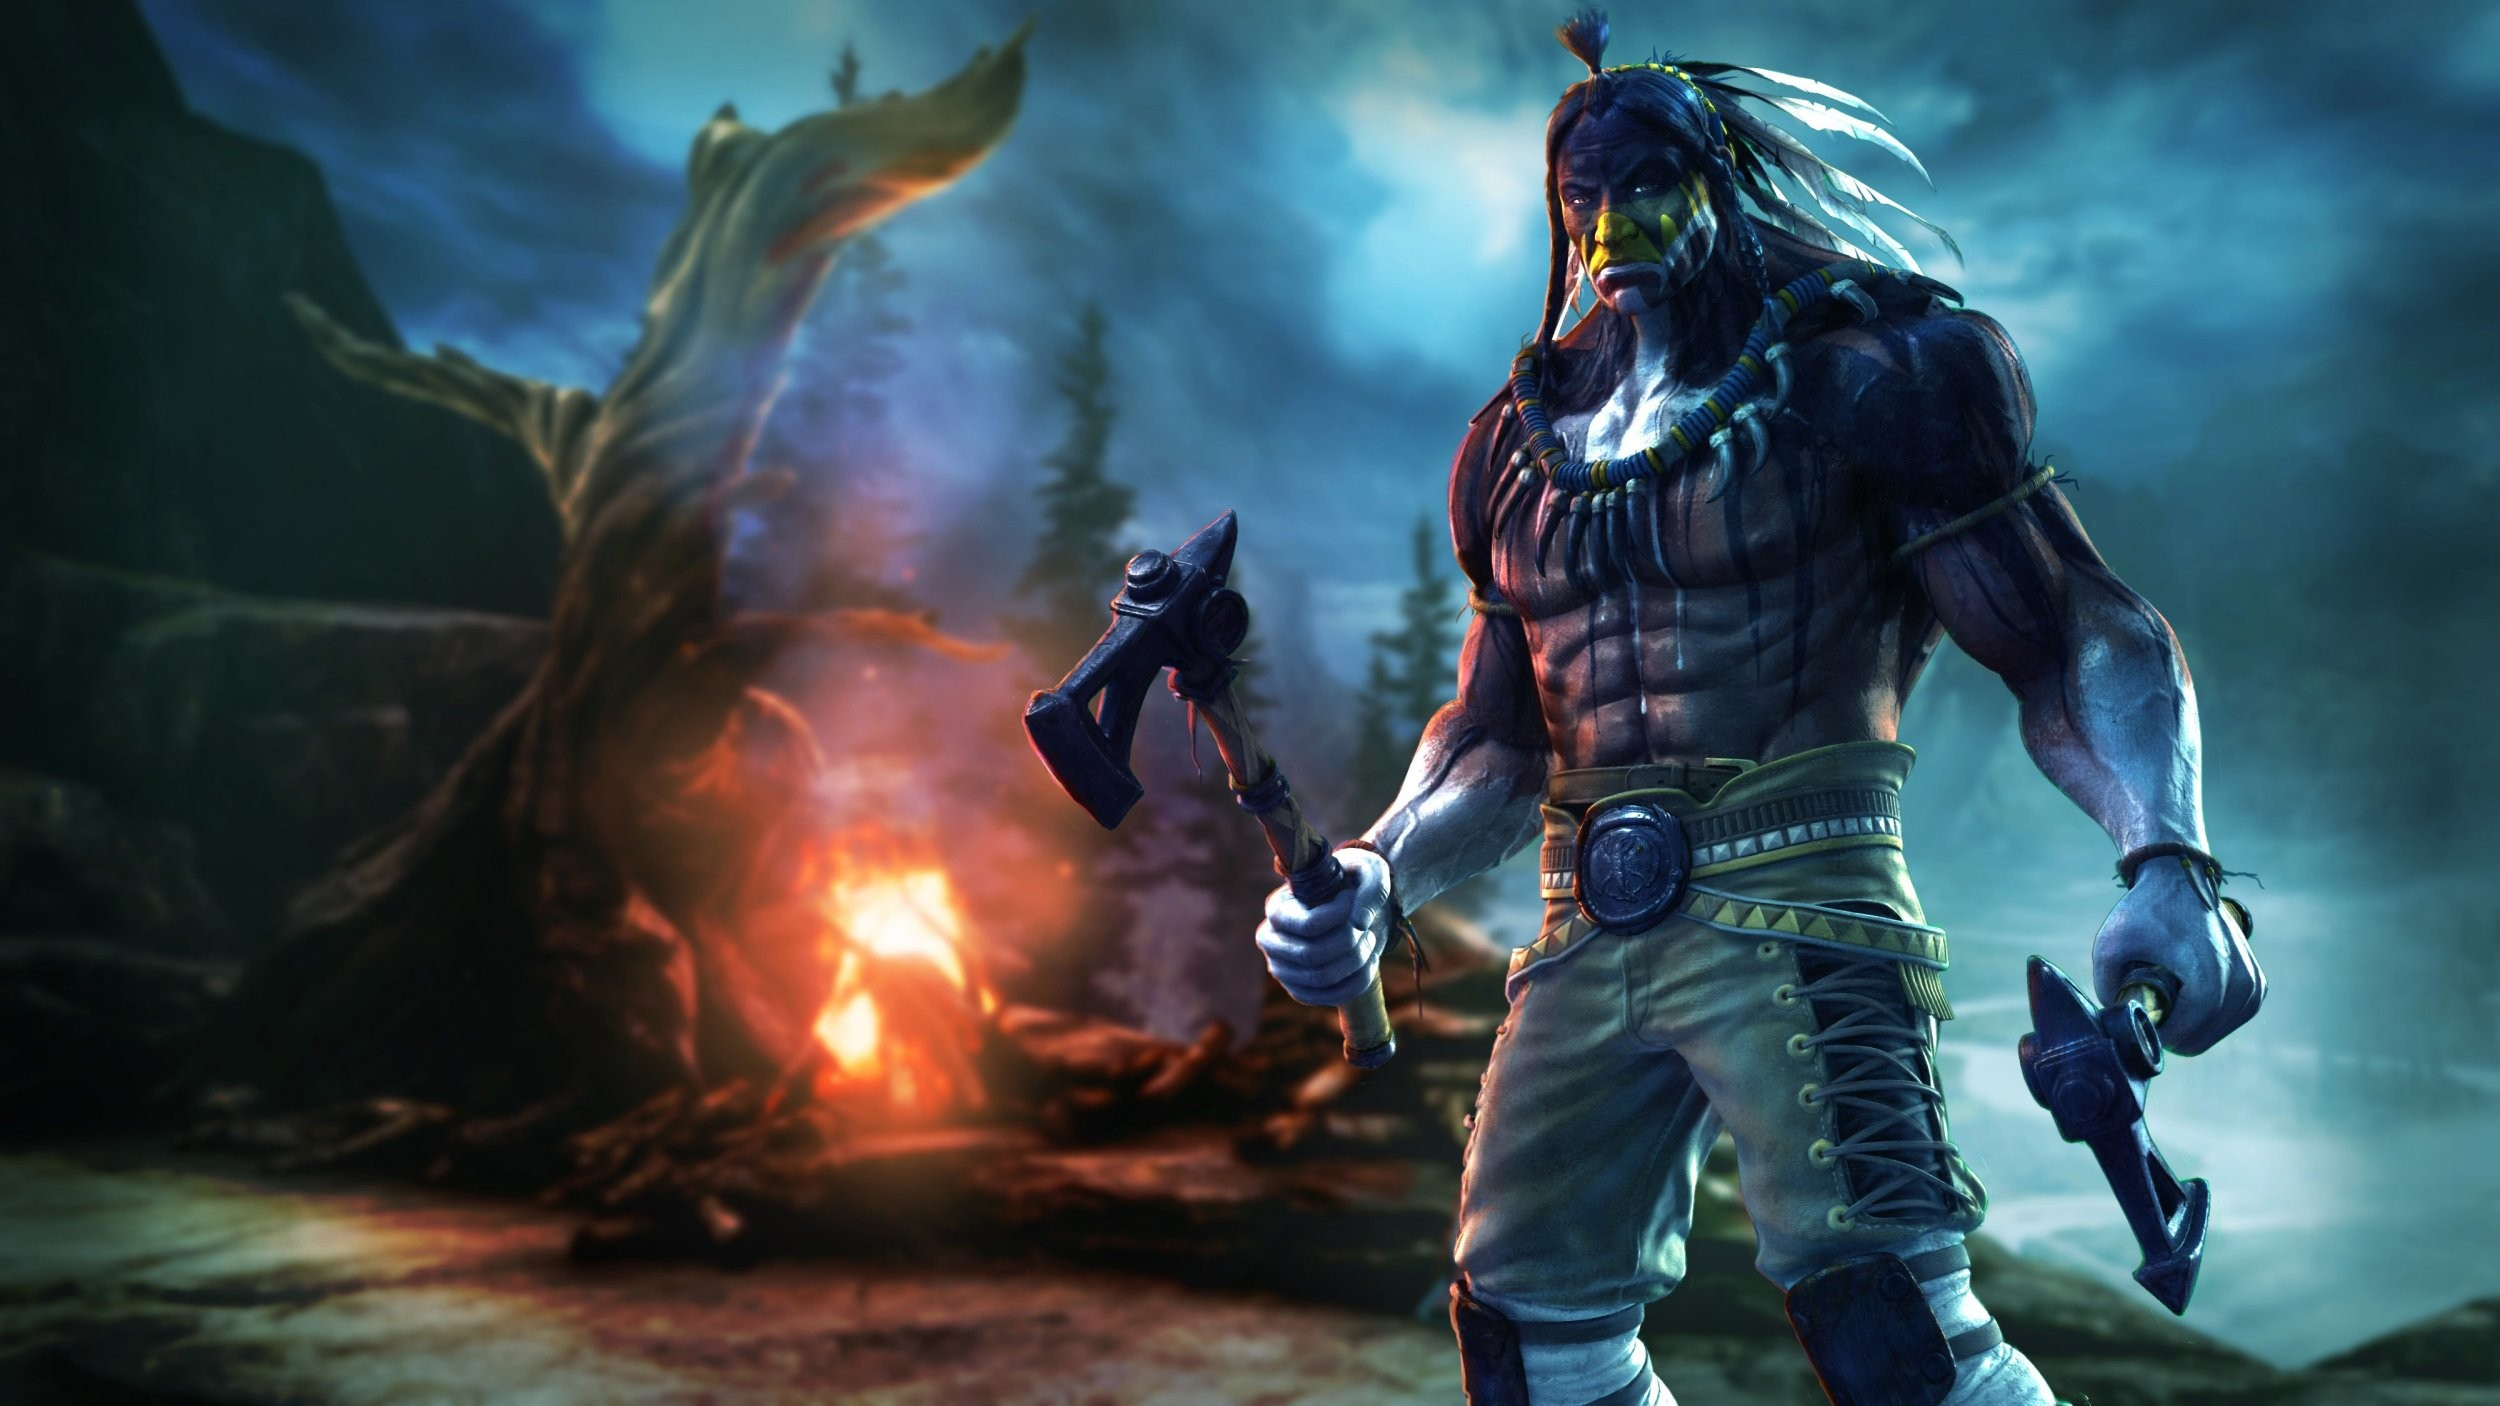 Return to TFG's Killer Instinct Profile .